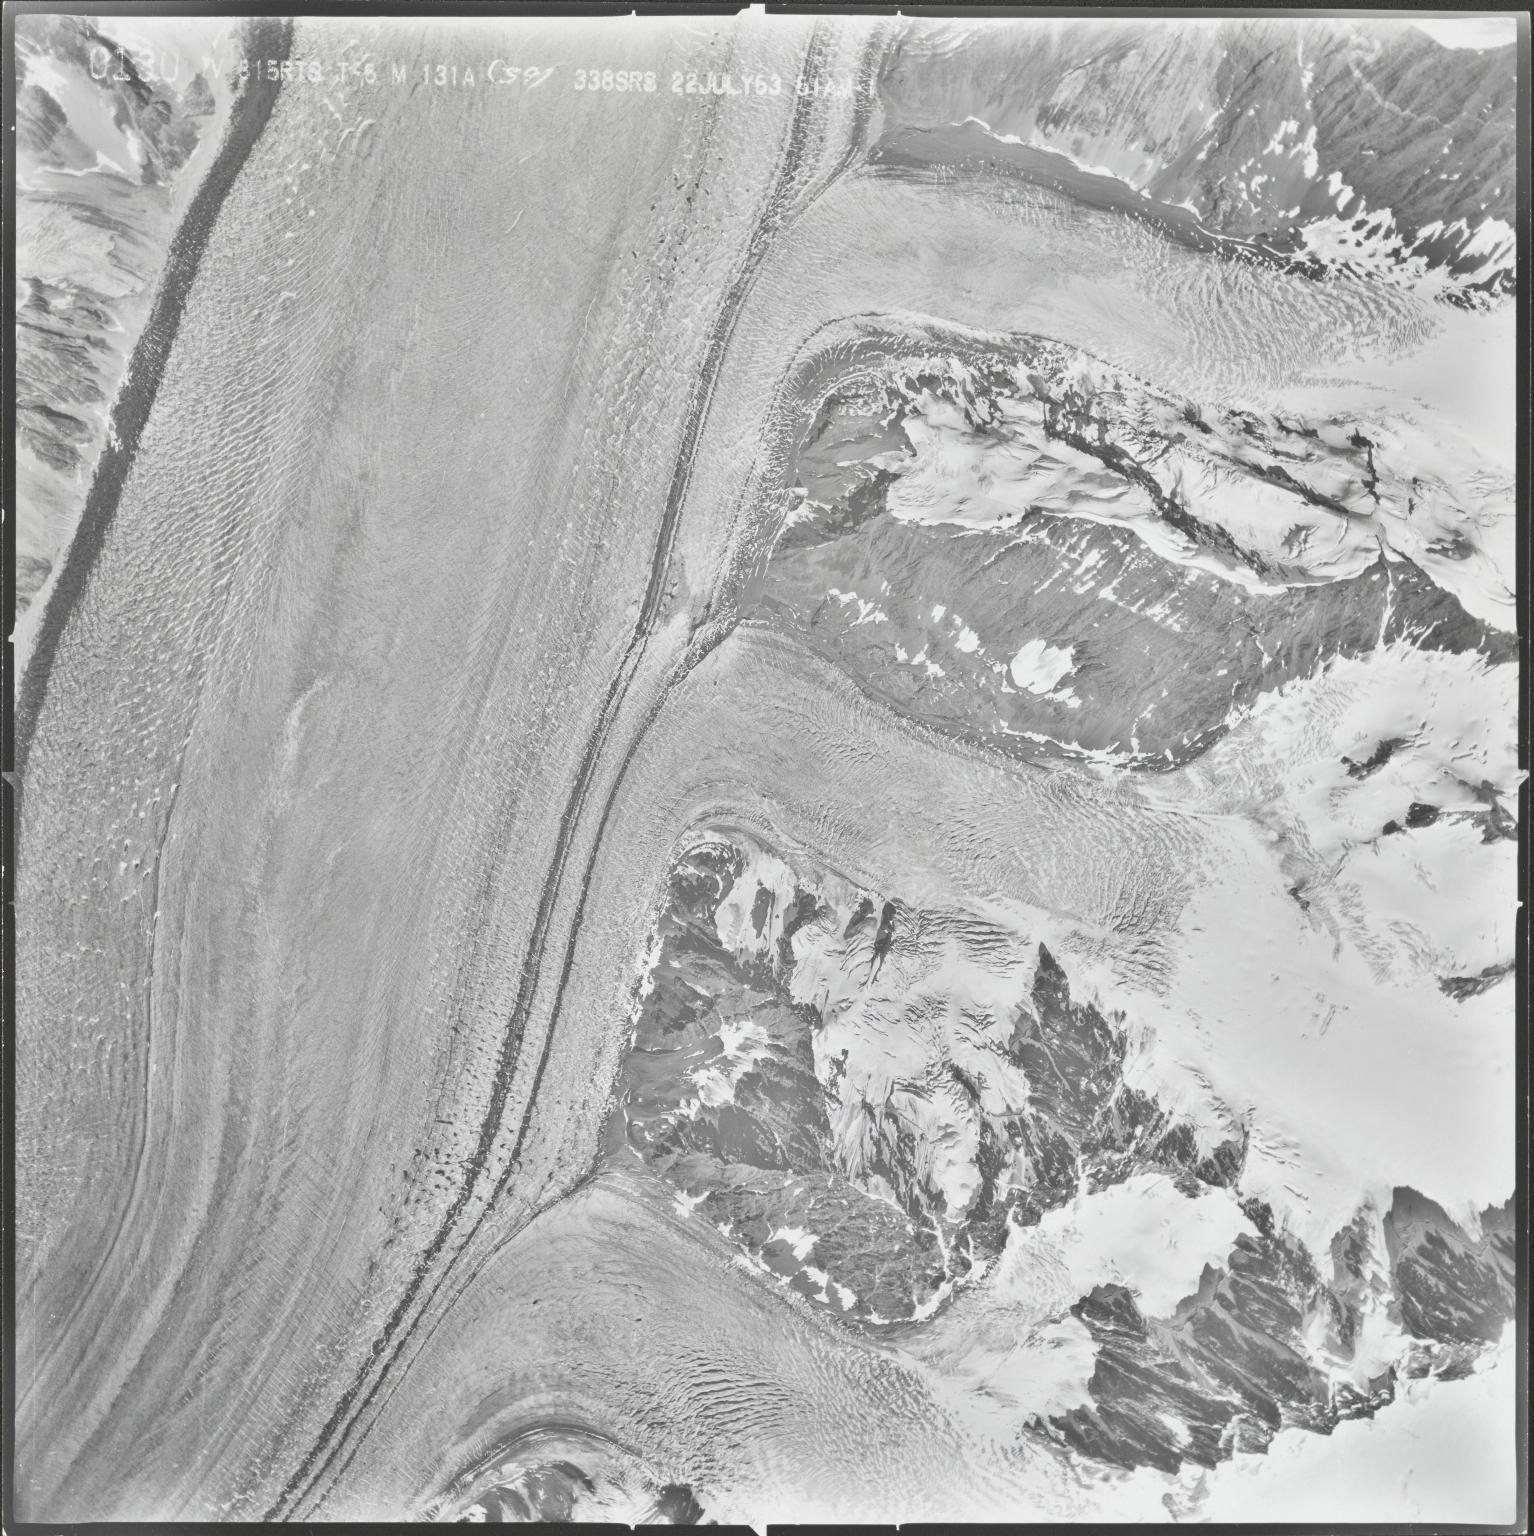 Kahilna Glacier, aerial photograph M131 A 130, Alaska